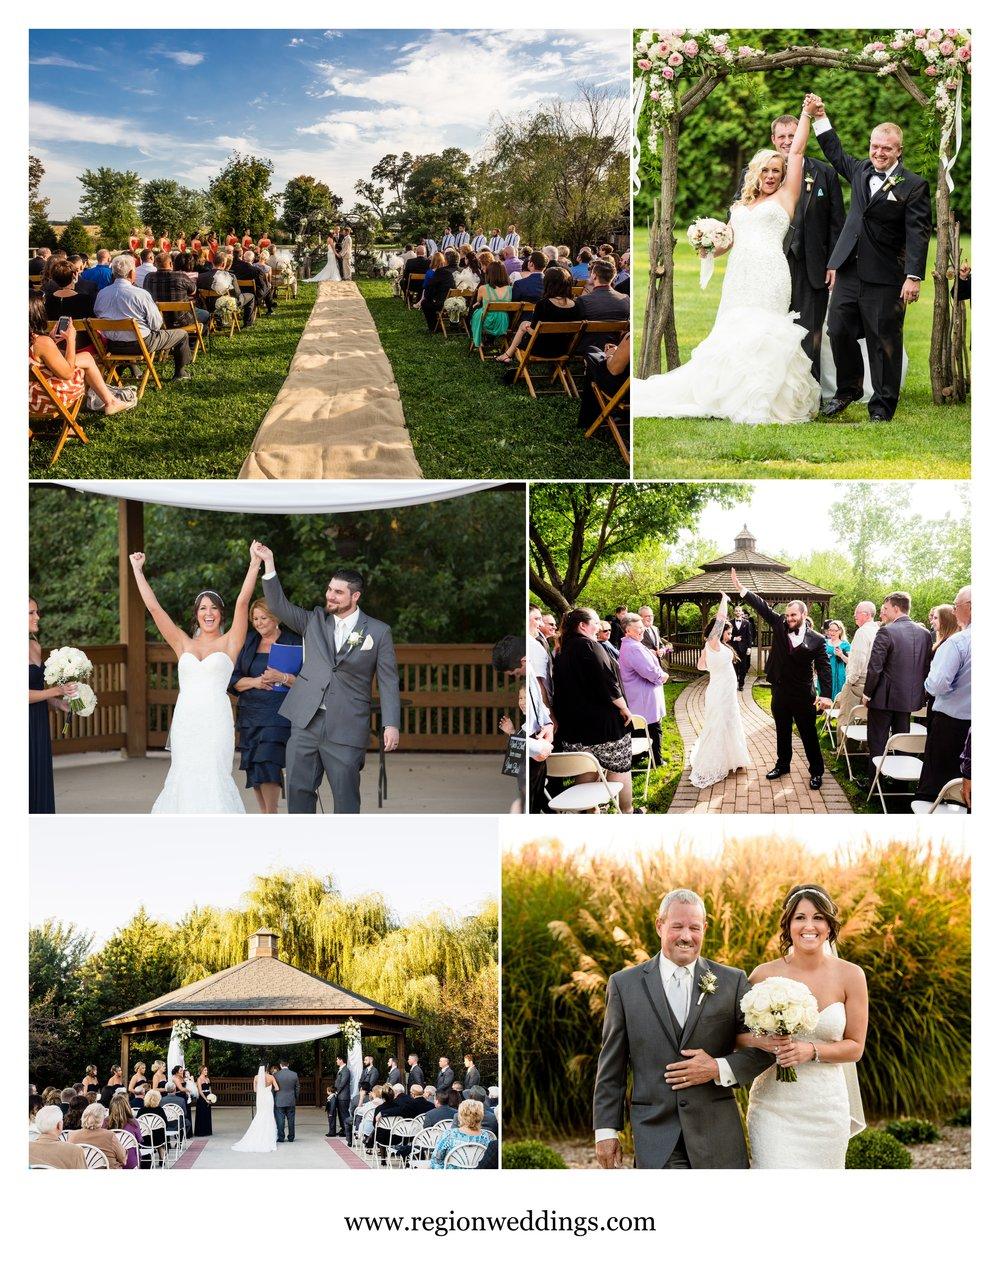 Outdoor wedding ceremonies in Northwest Indiana and Southwest Michigan.